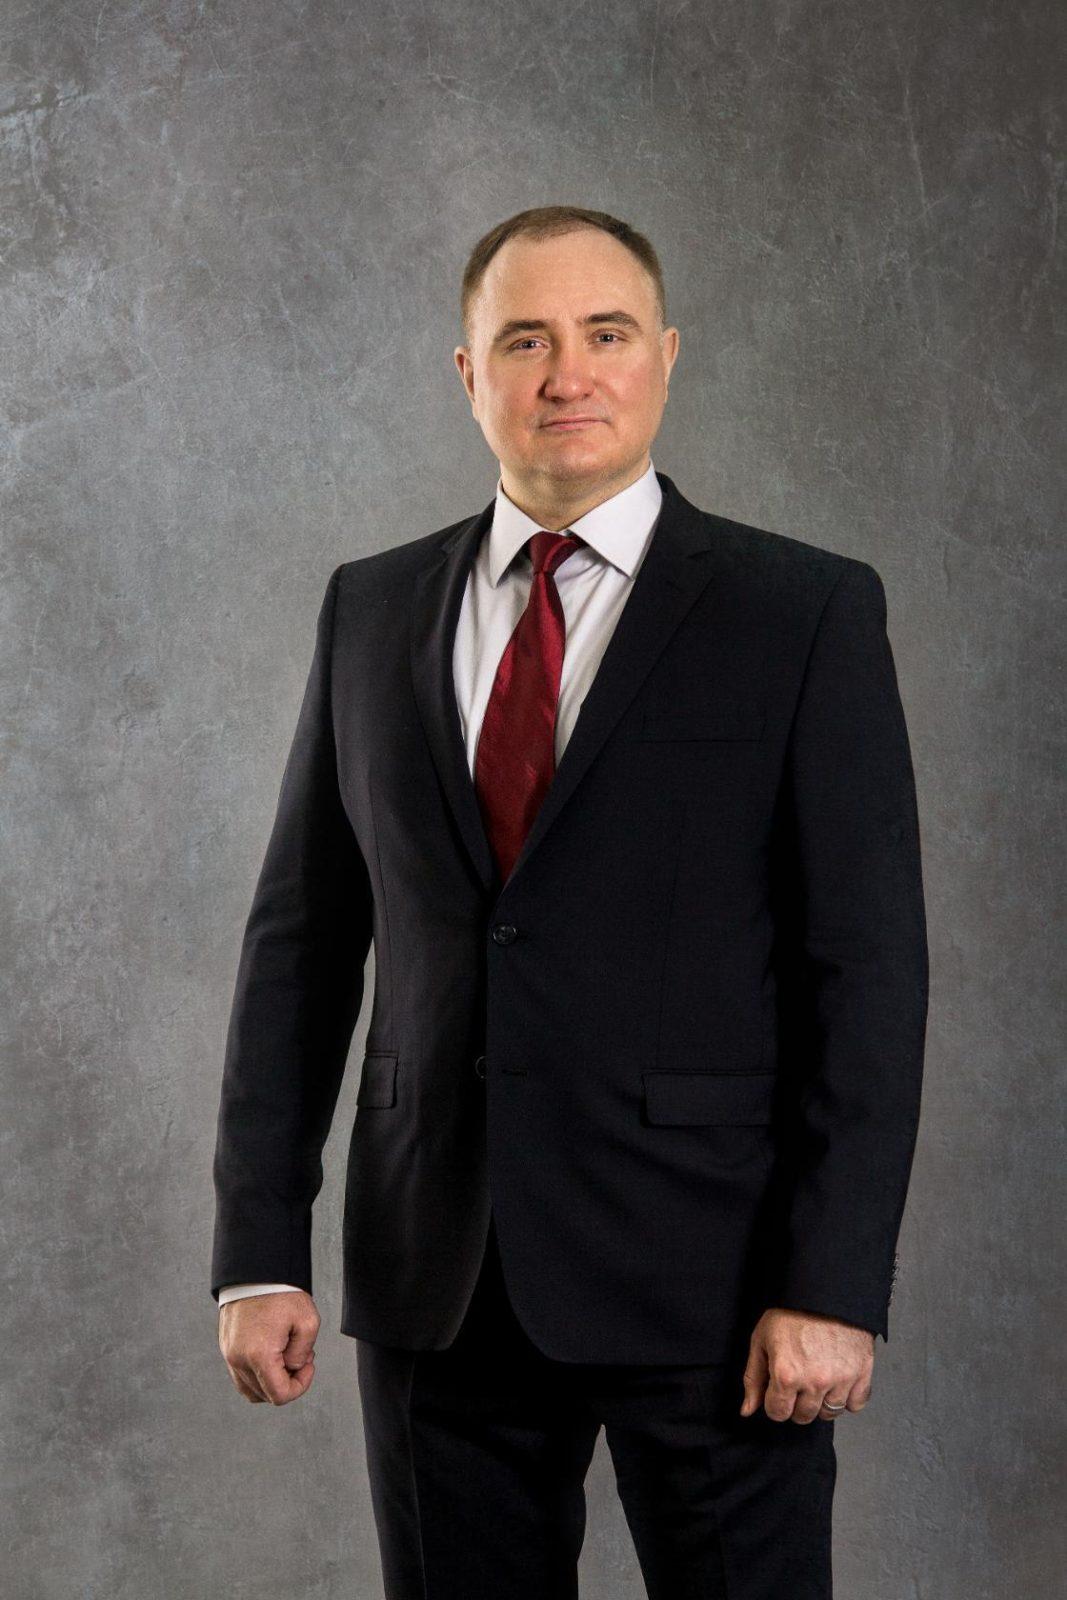 адвокат Татаринов Александр Павлович (стаж с 2002 года)